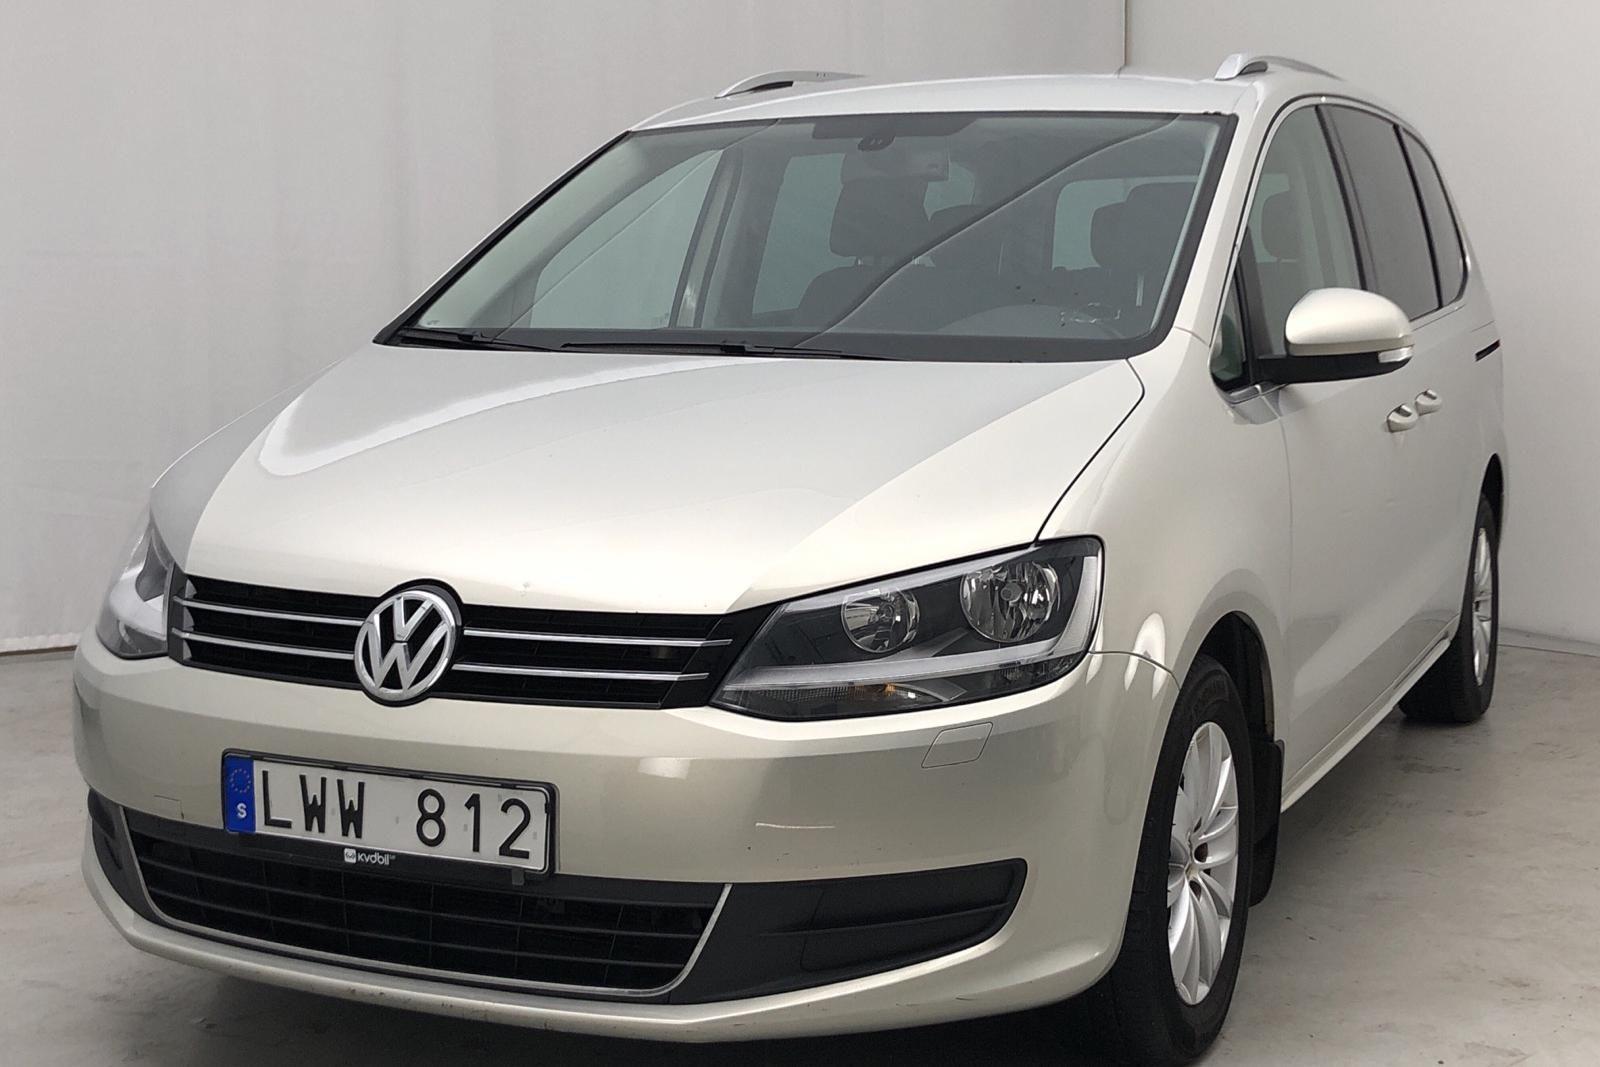 VW Sharan 2.0 TDI BlueMotion-Технология (140 hk)